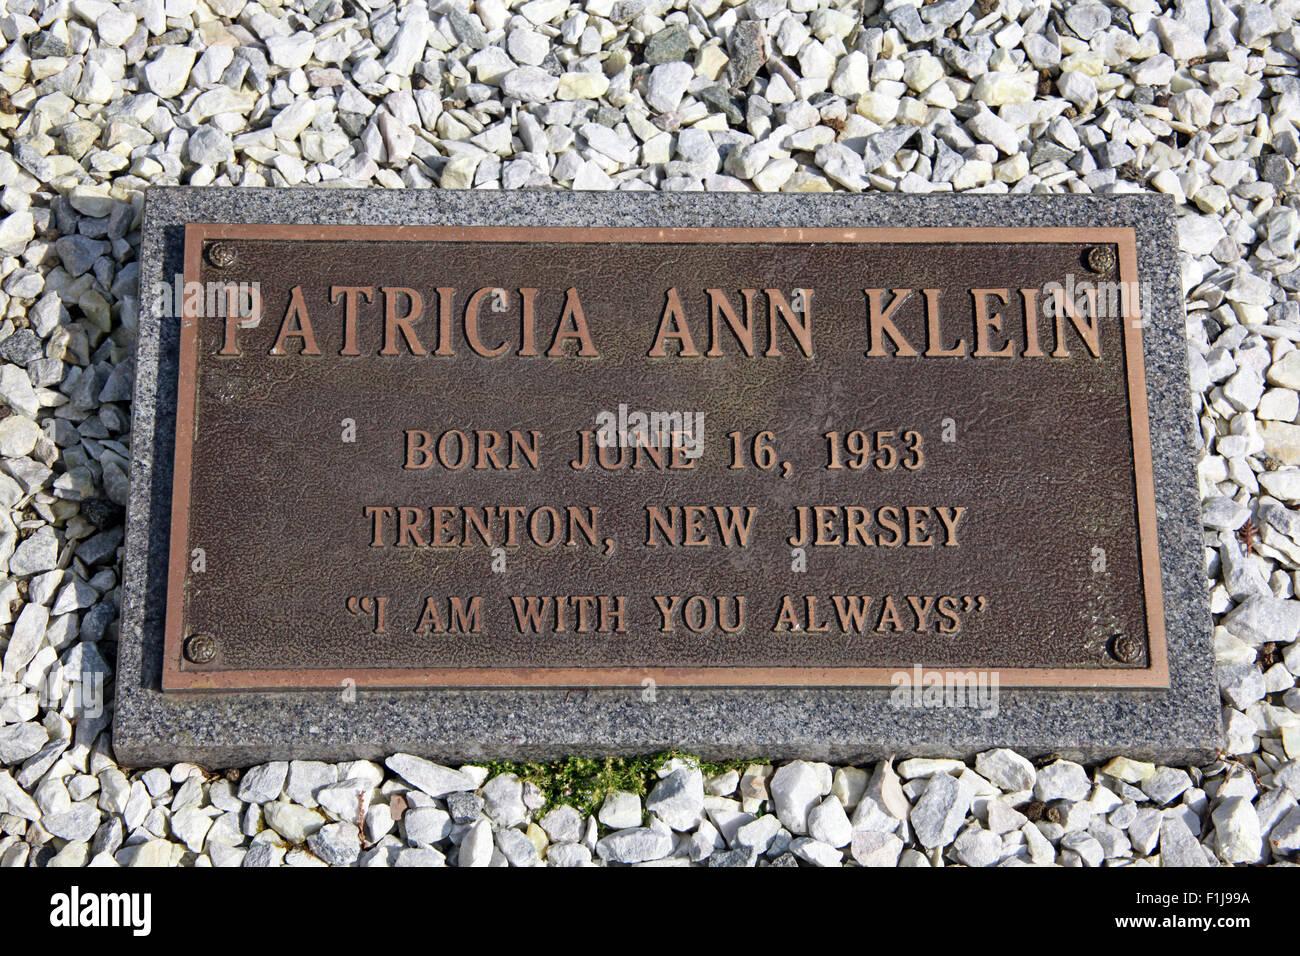 Lockerbie PanAm103 In Rememberance Memorial Patricia Ann Klein, Scotland - Stock Image